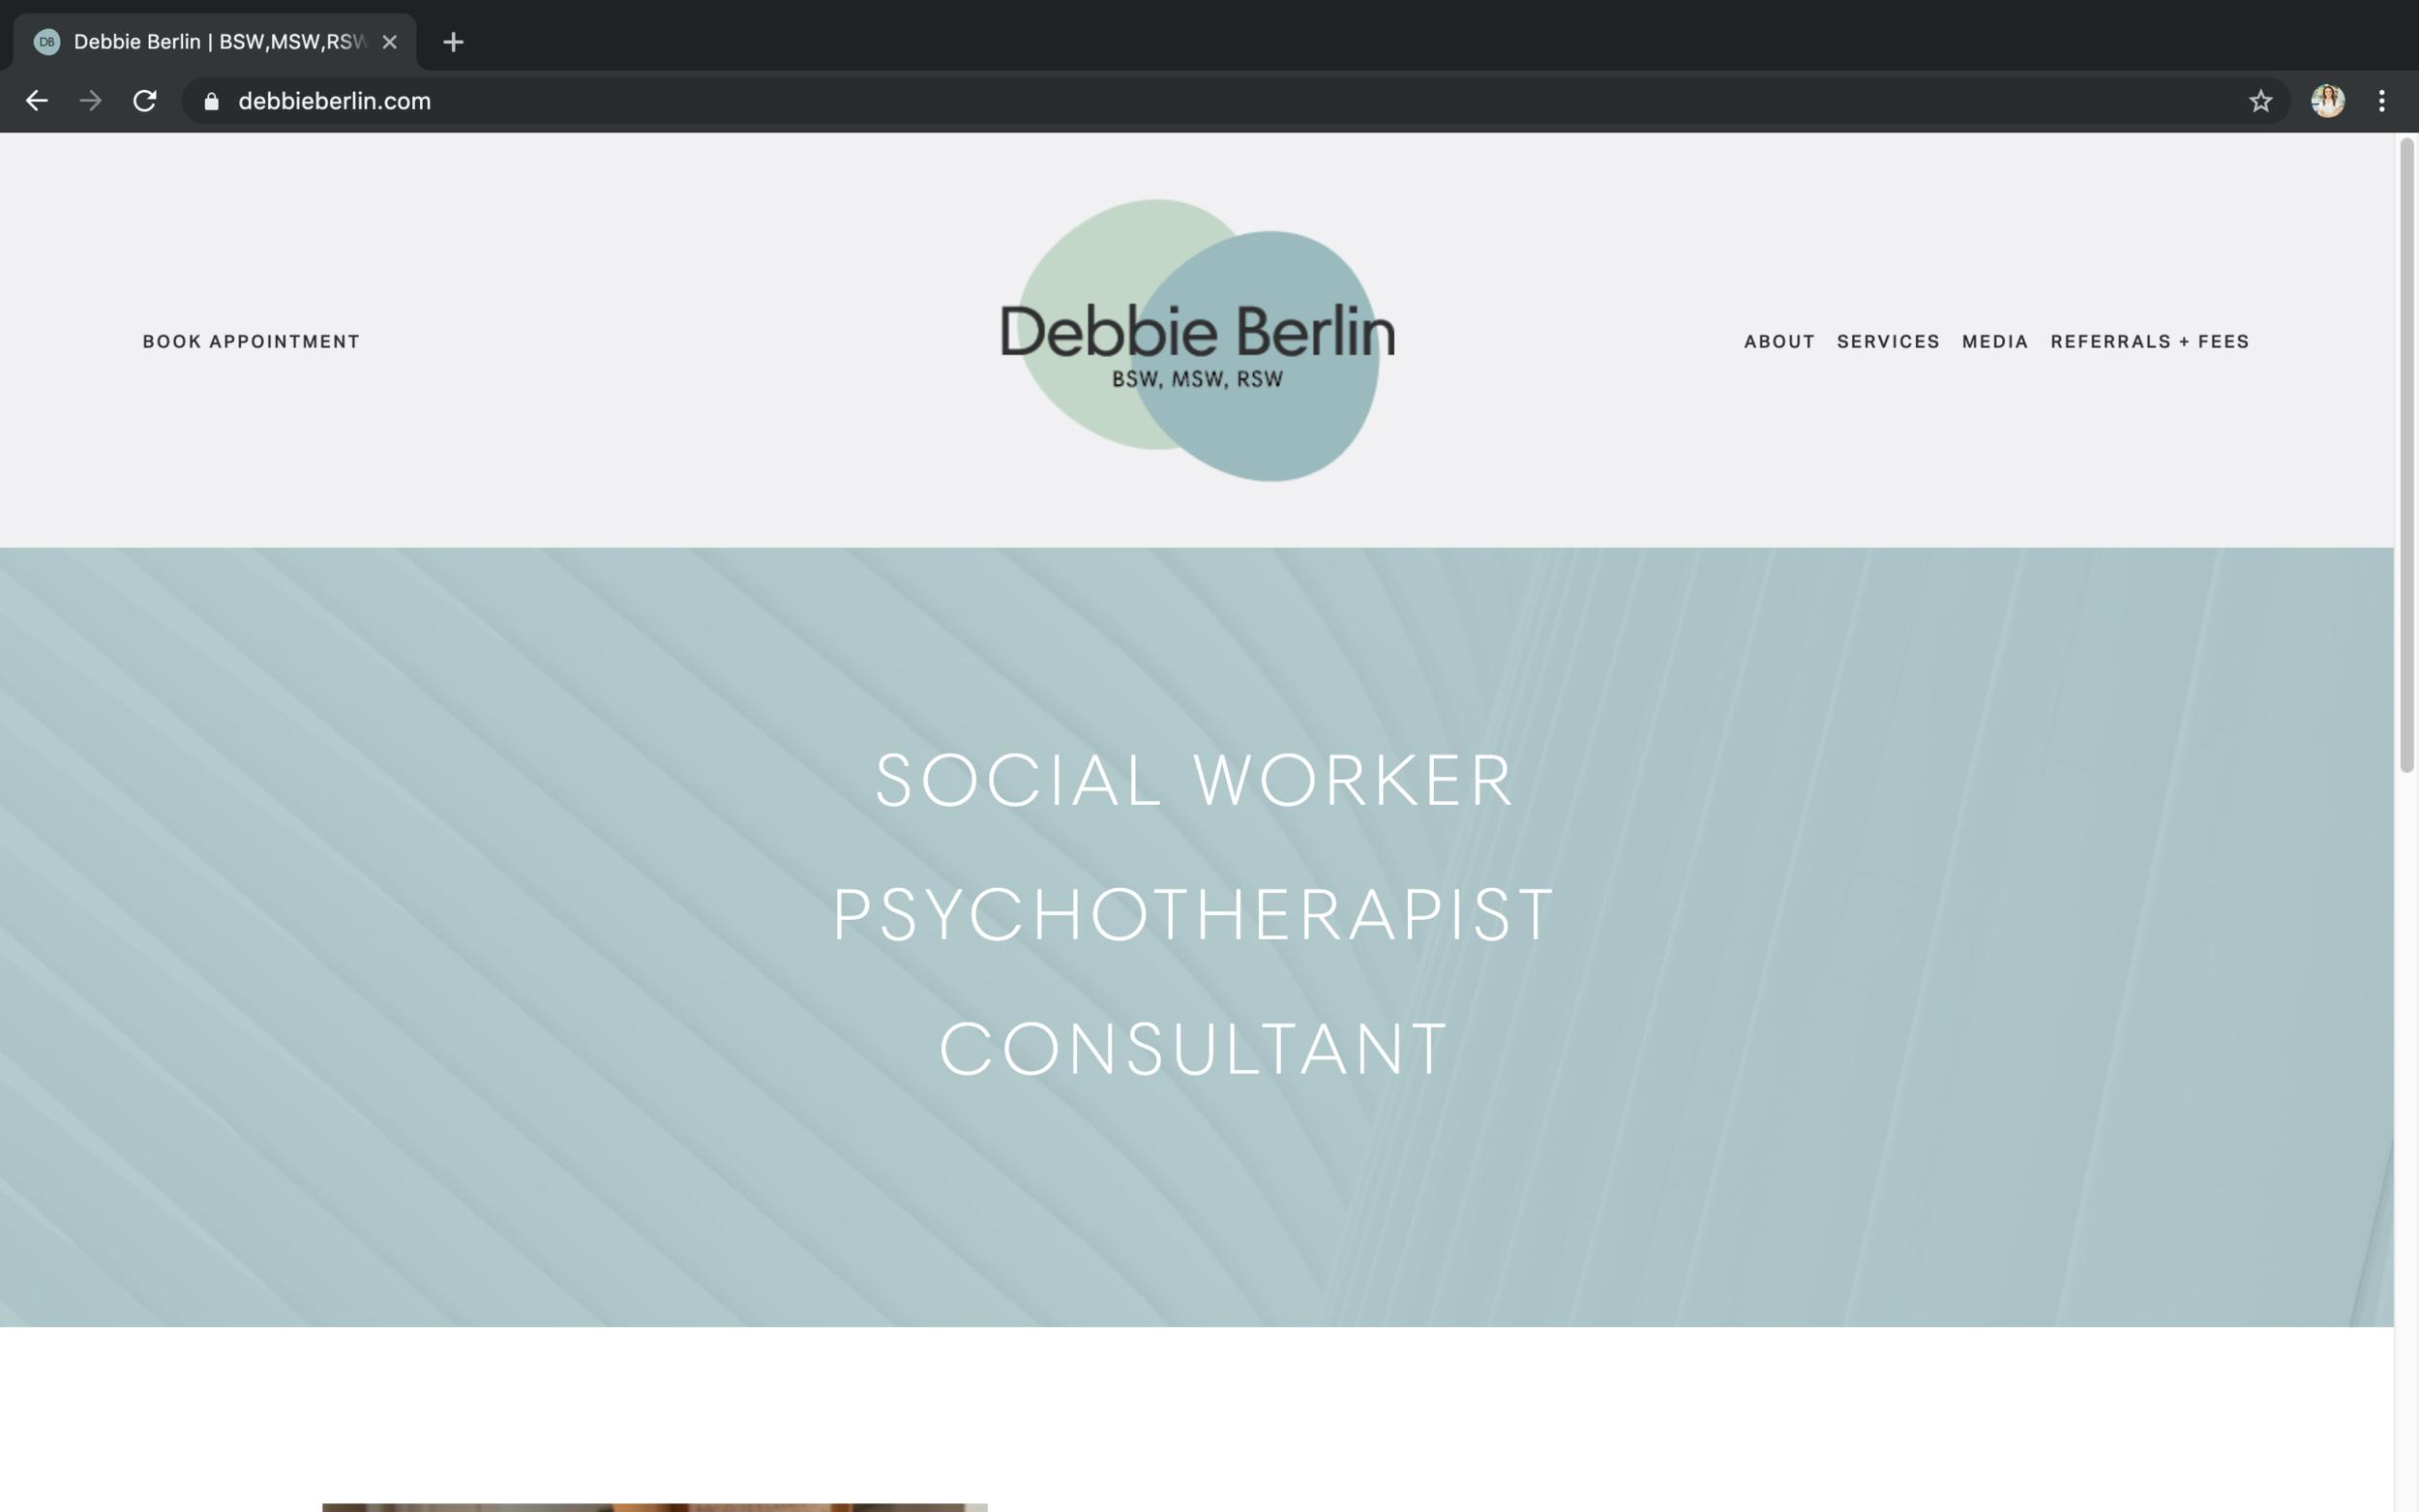 DEBBIE BERLIN